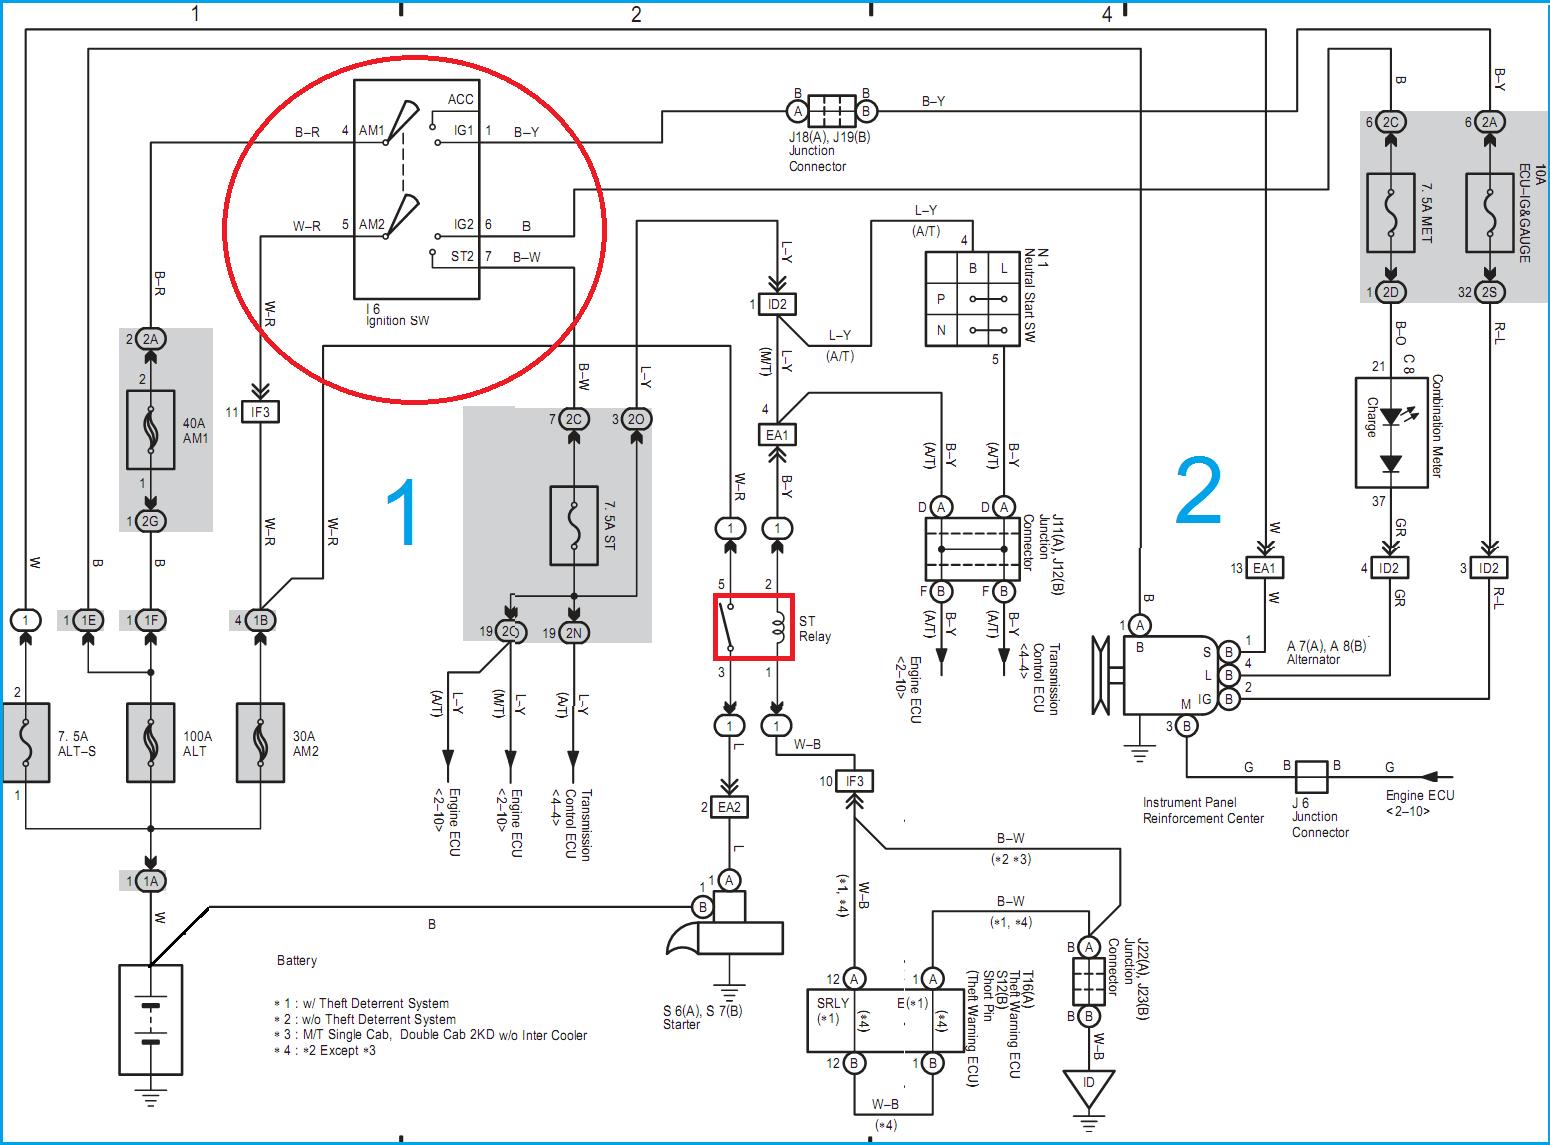 TOYOTA HILUX REVO WIRING  ENGINE: Toyota KD engine(1KD